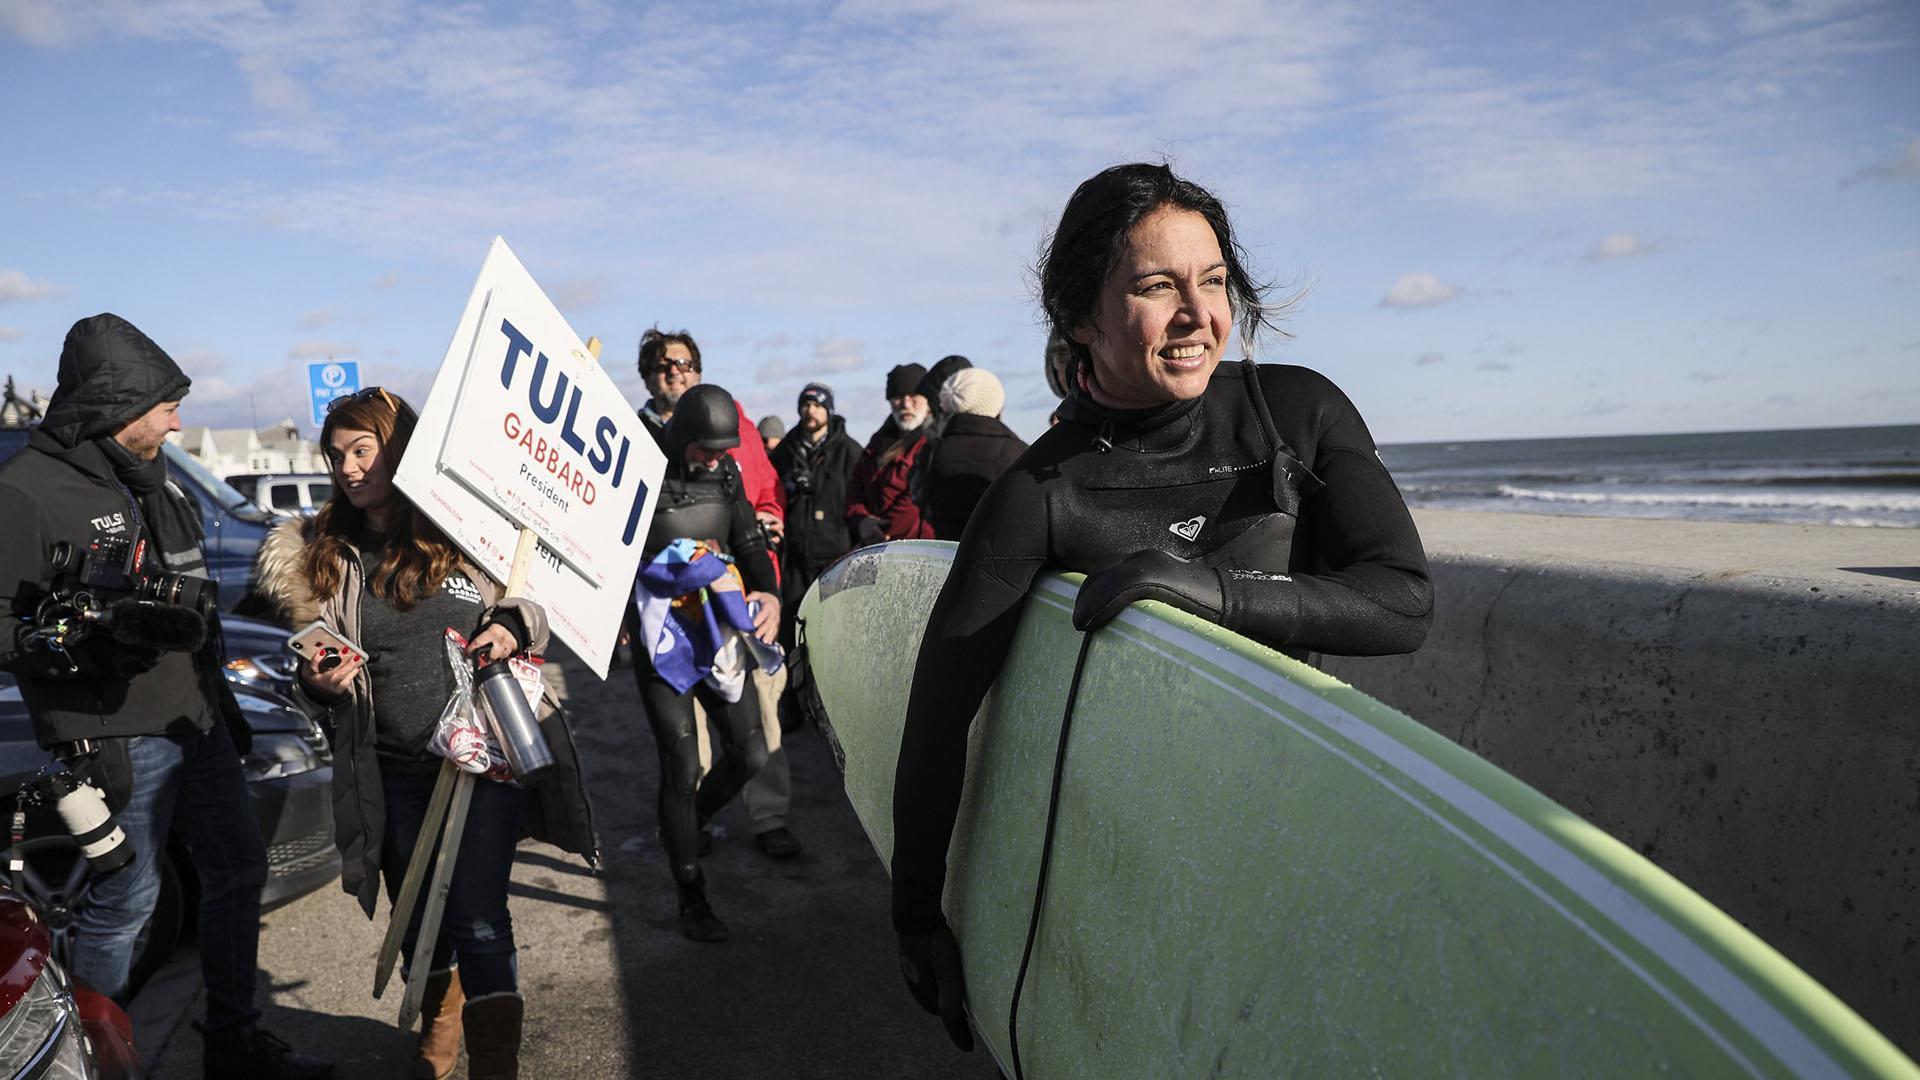 Tulsi Gabbard Makes A Splash Surfing In Freezing New Hampshire